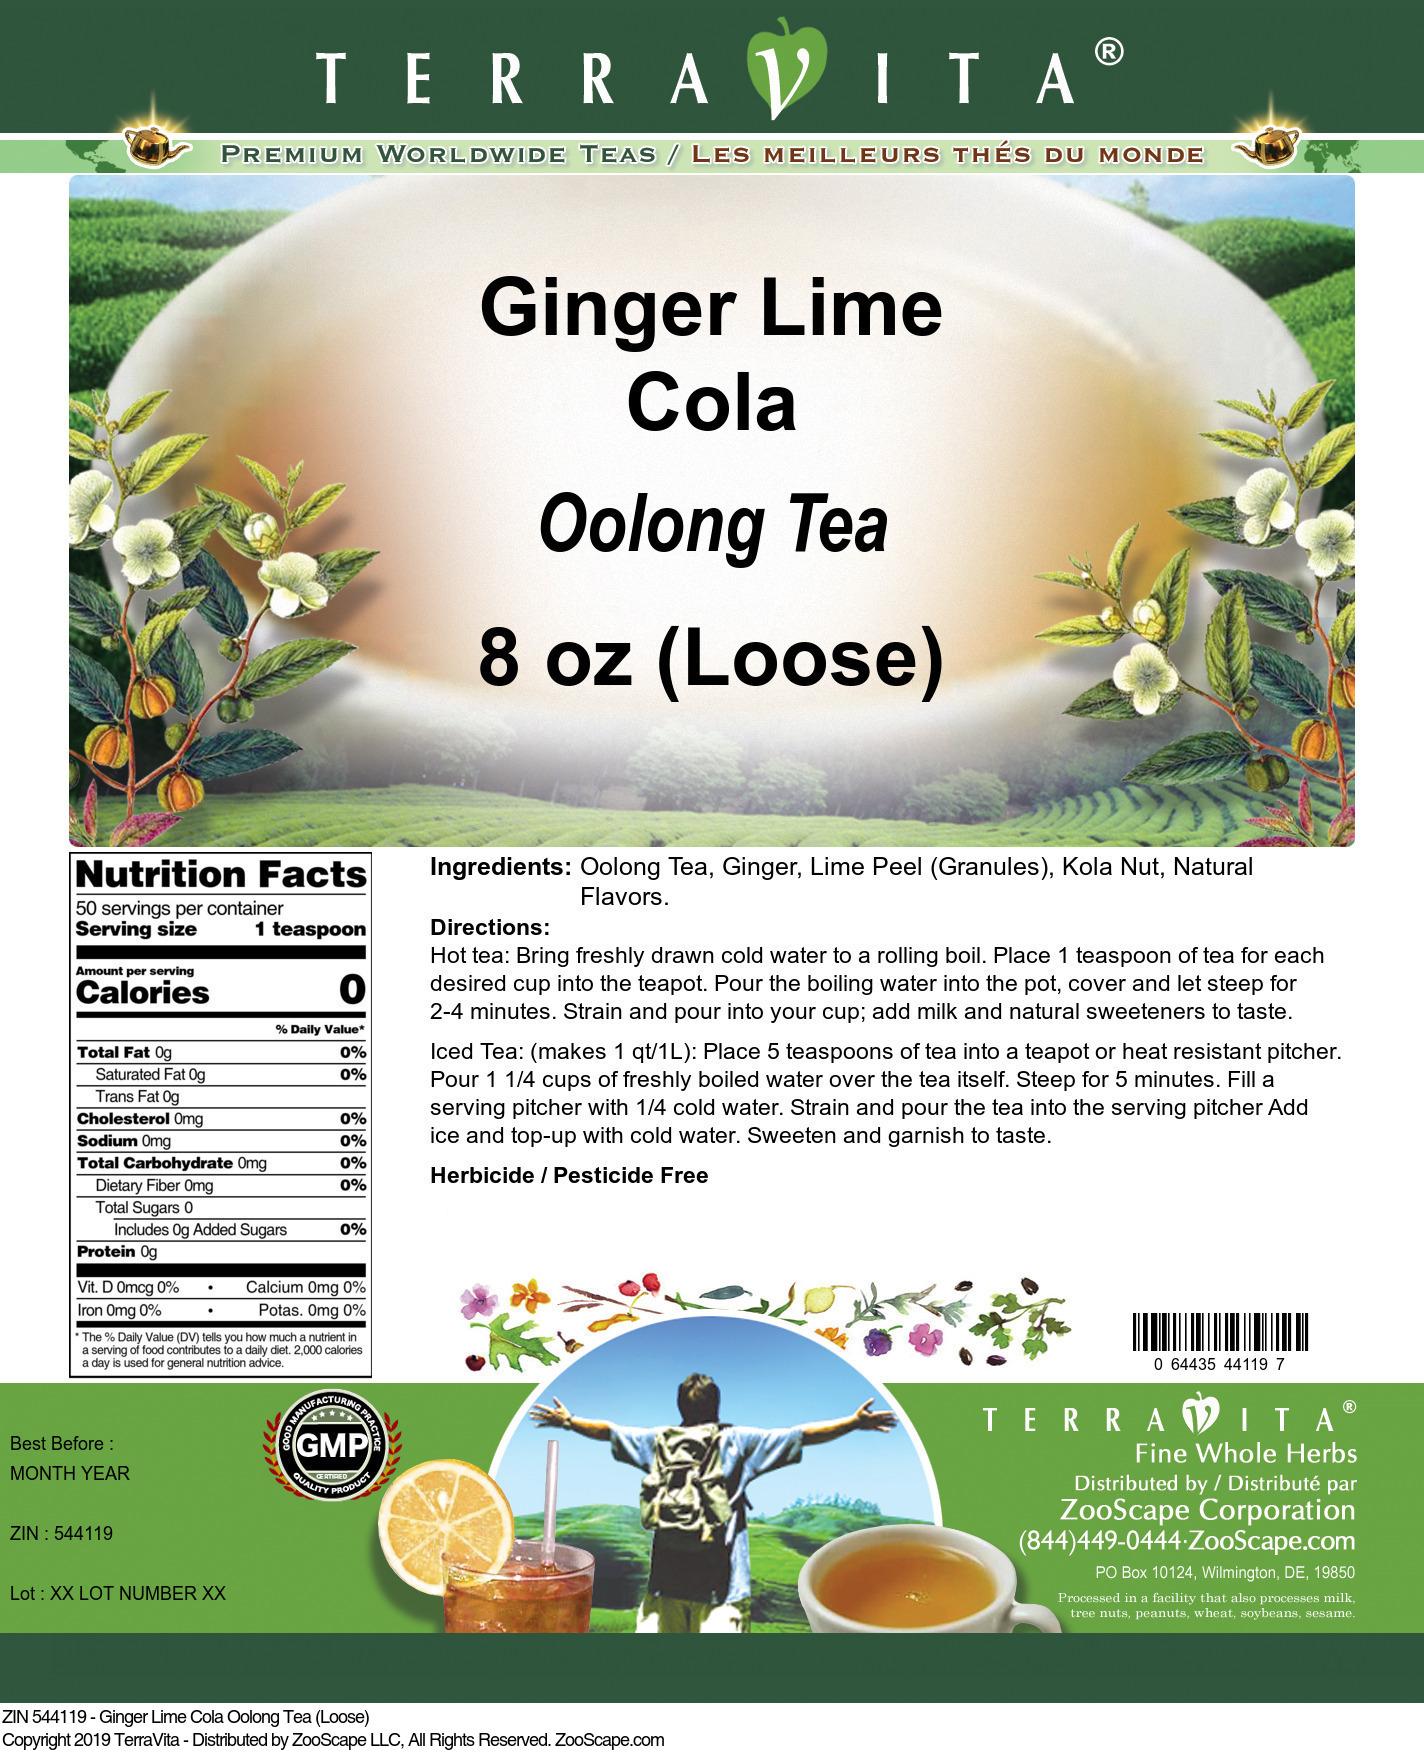 Ginger Lime Cola Oolong Tea (Loose)